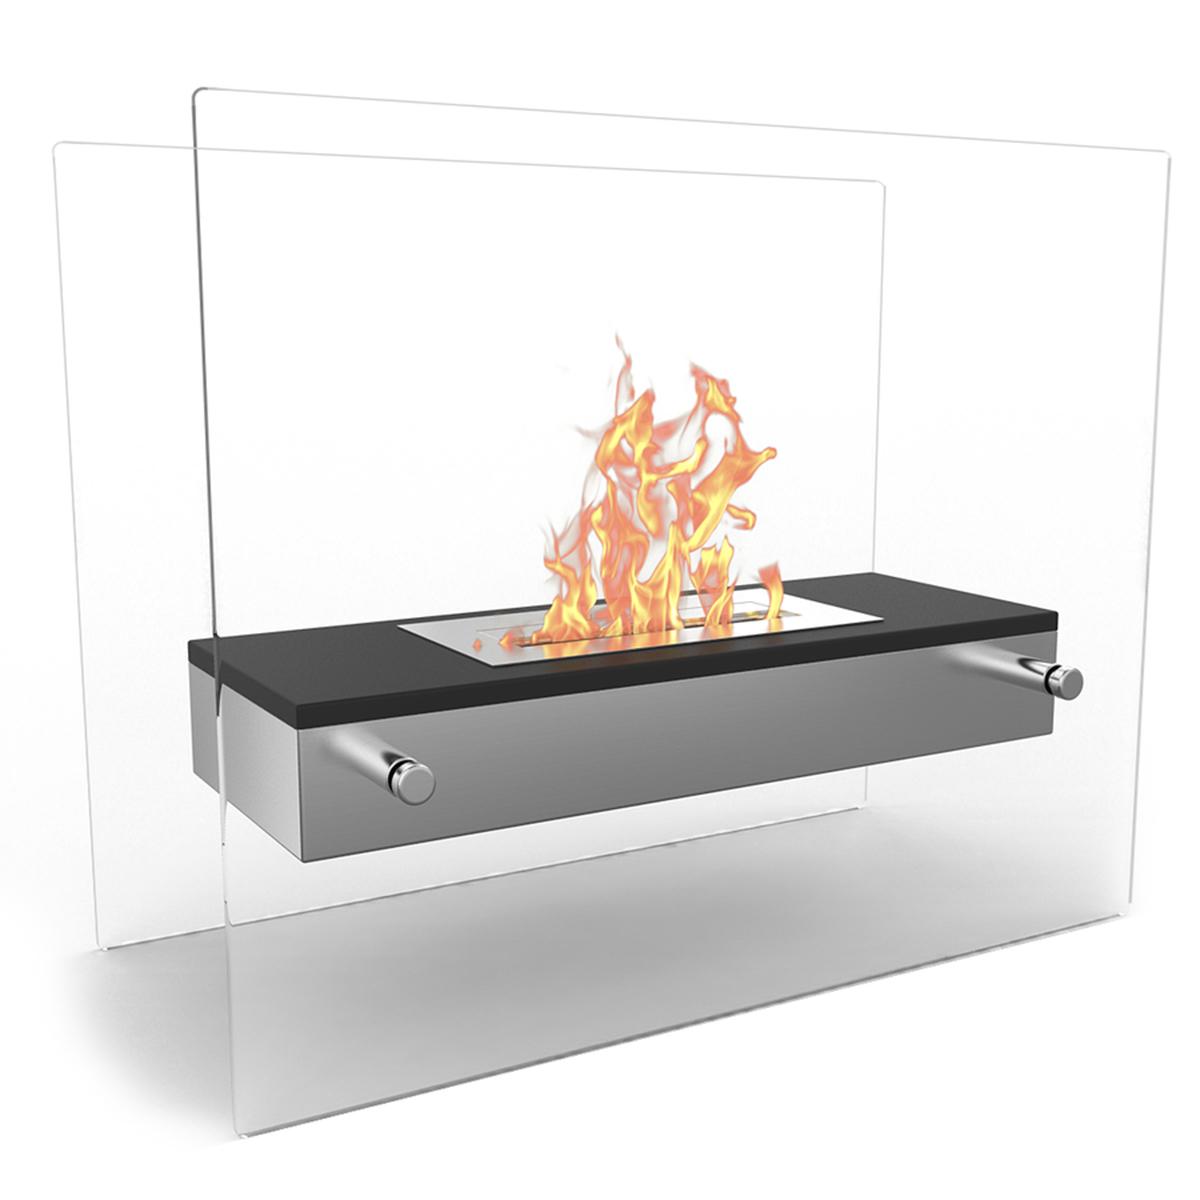 Regal Flame Vista H Tabletop Firepit Bio Ethanol Ventless Fireplace Black